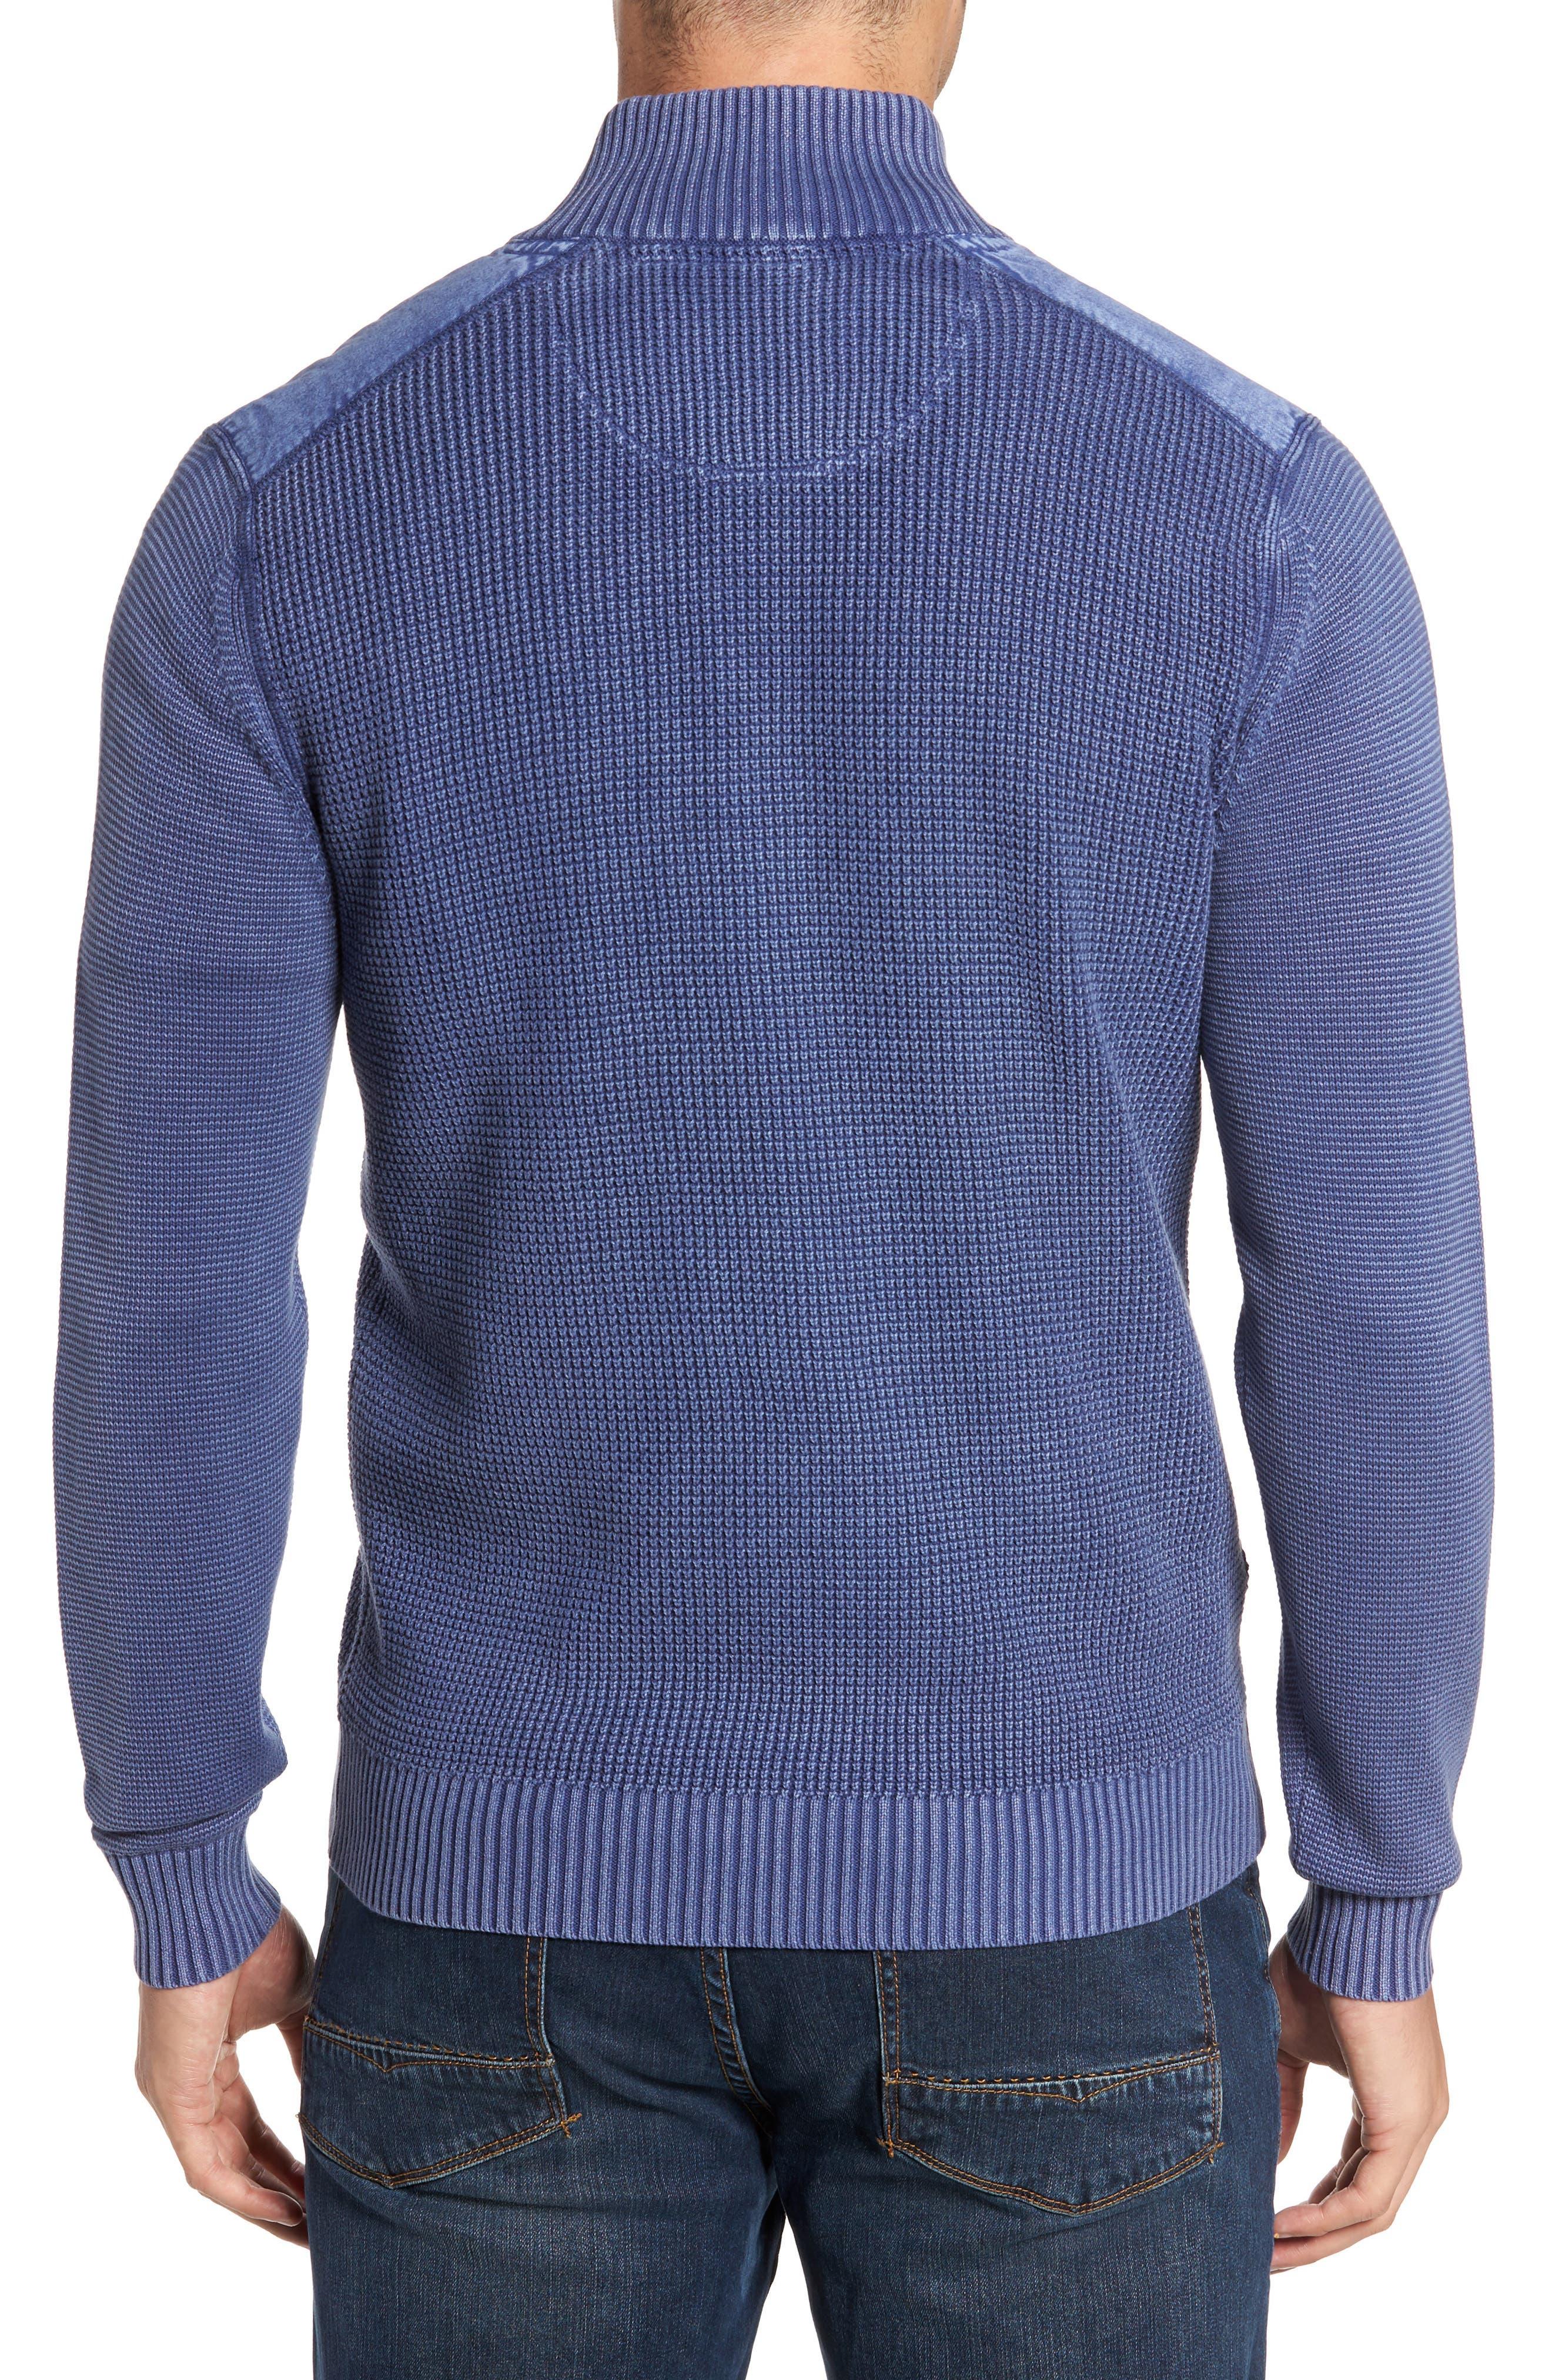 Coastal Shores Quarter Zip Sweater,                             Alternate thumbnail 9, color,